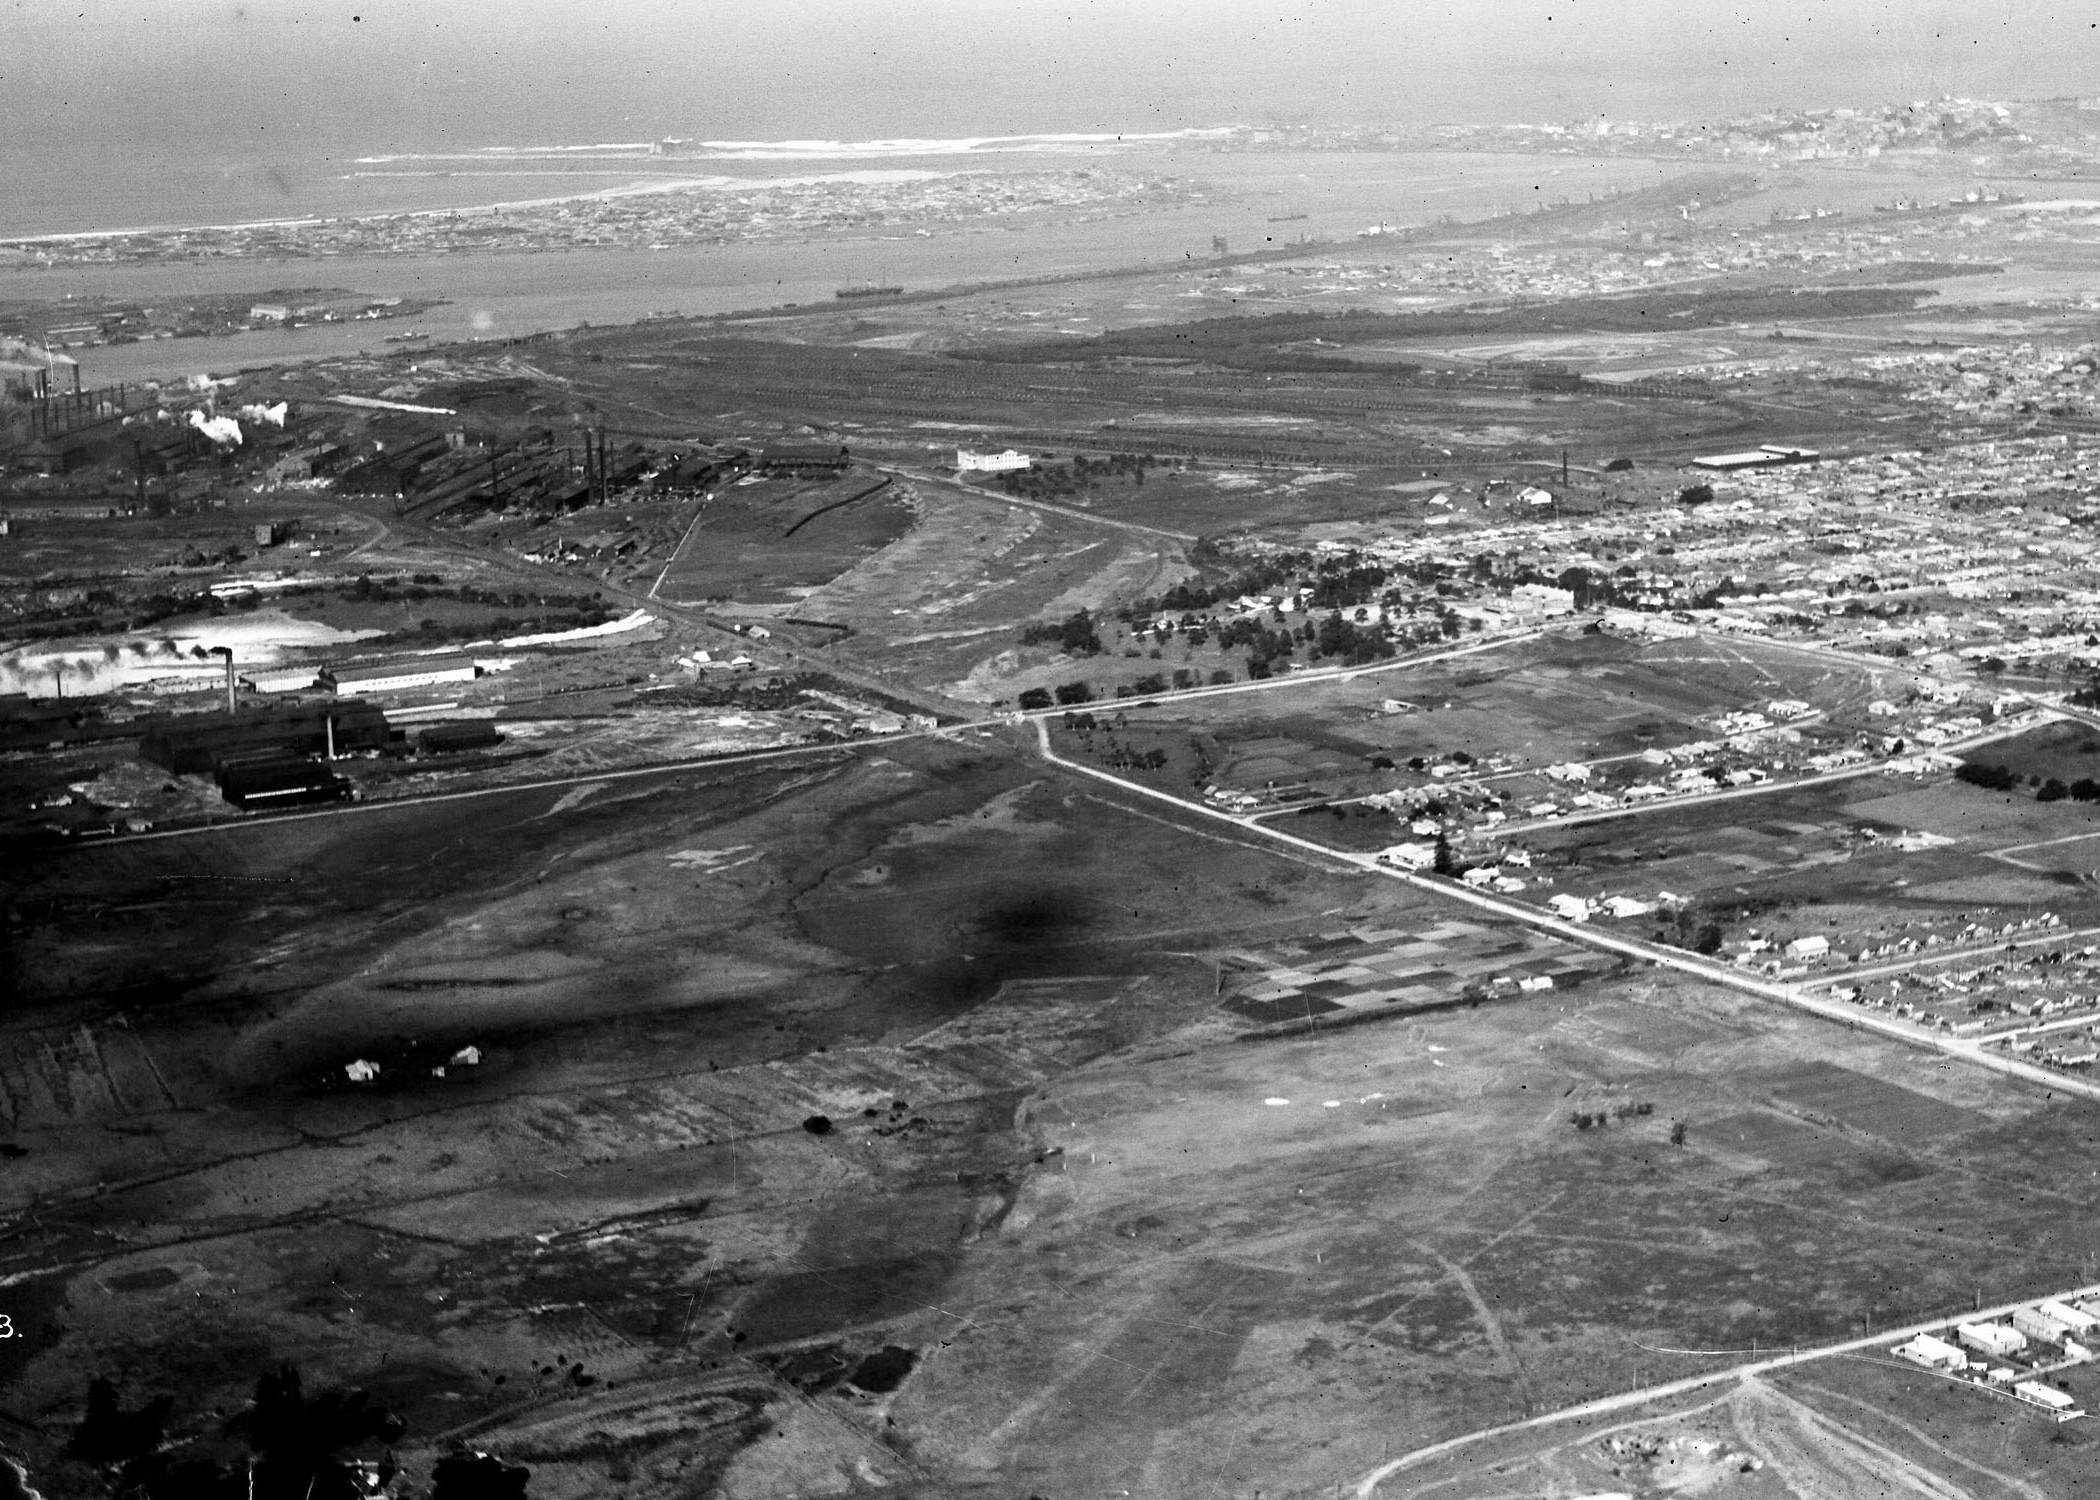 Newcastle aerial, 1930 (Image 58 Courtesy of Phillip Warren)